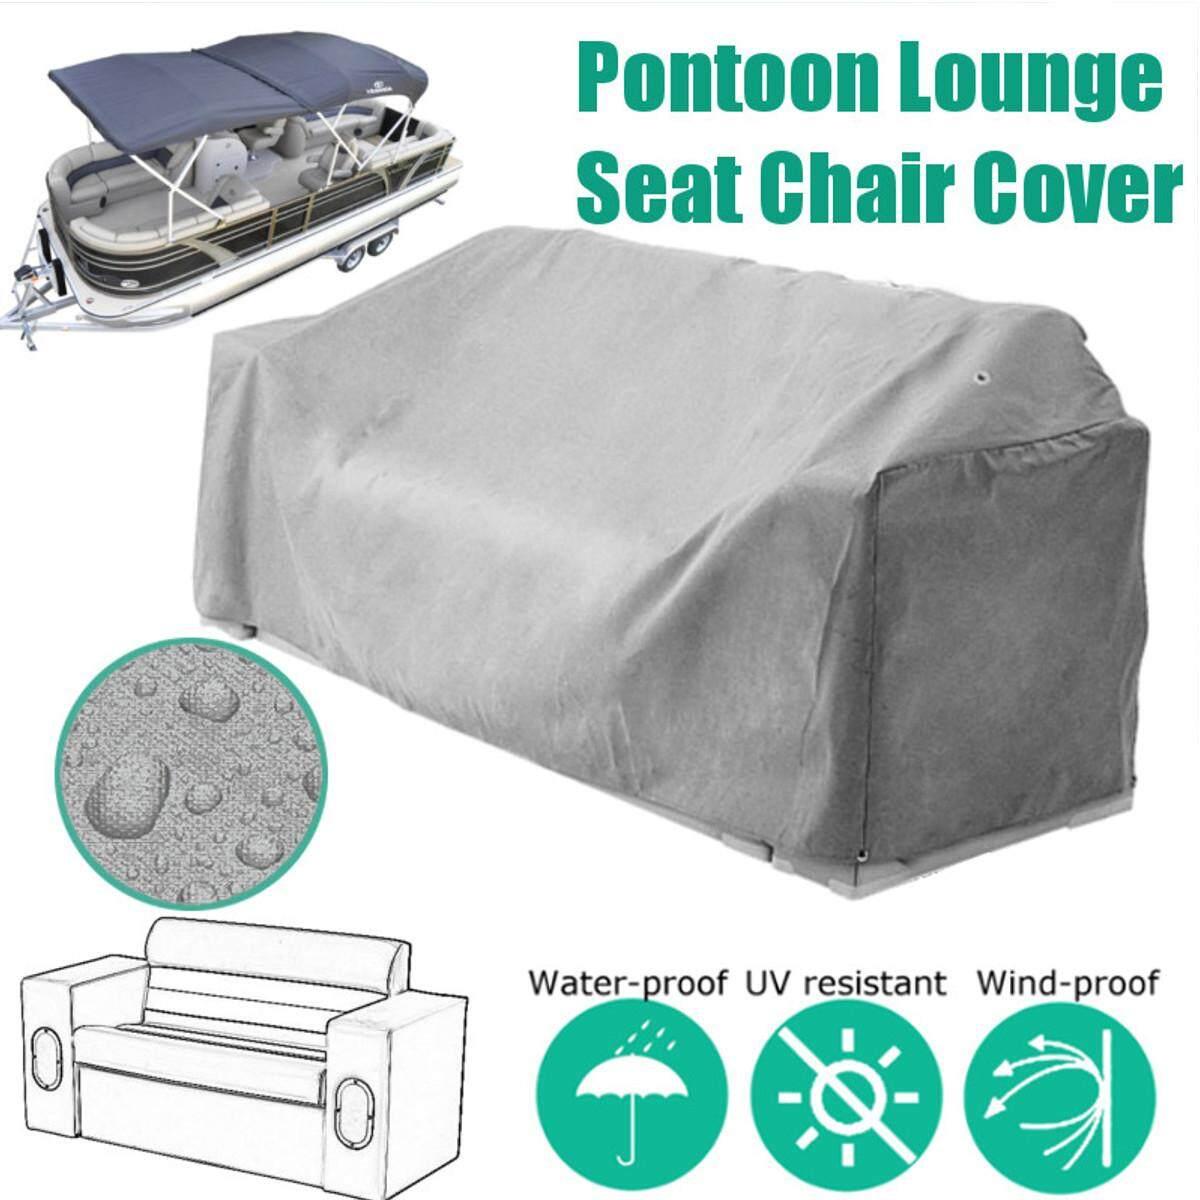 Waterproof Pontoon Lounge Seat Chair Cover 23D x56W x 29H Grey